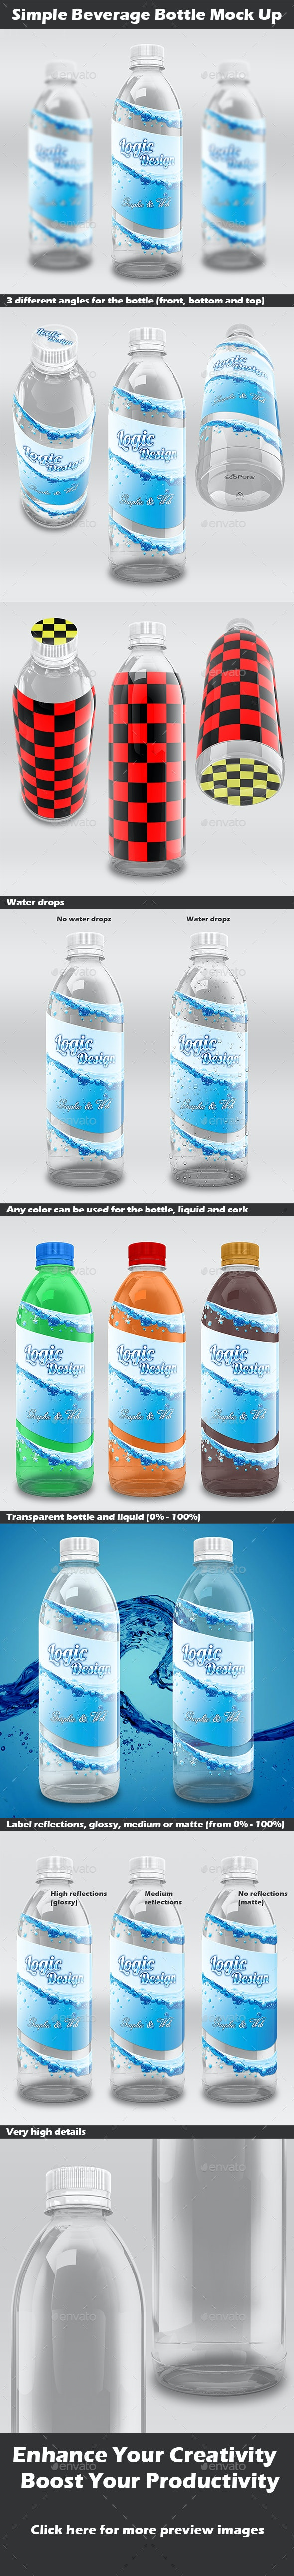 Simple Beverage Bottle Mock-Up - Food and Drink Packaging